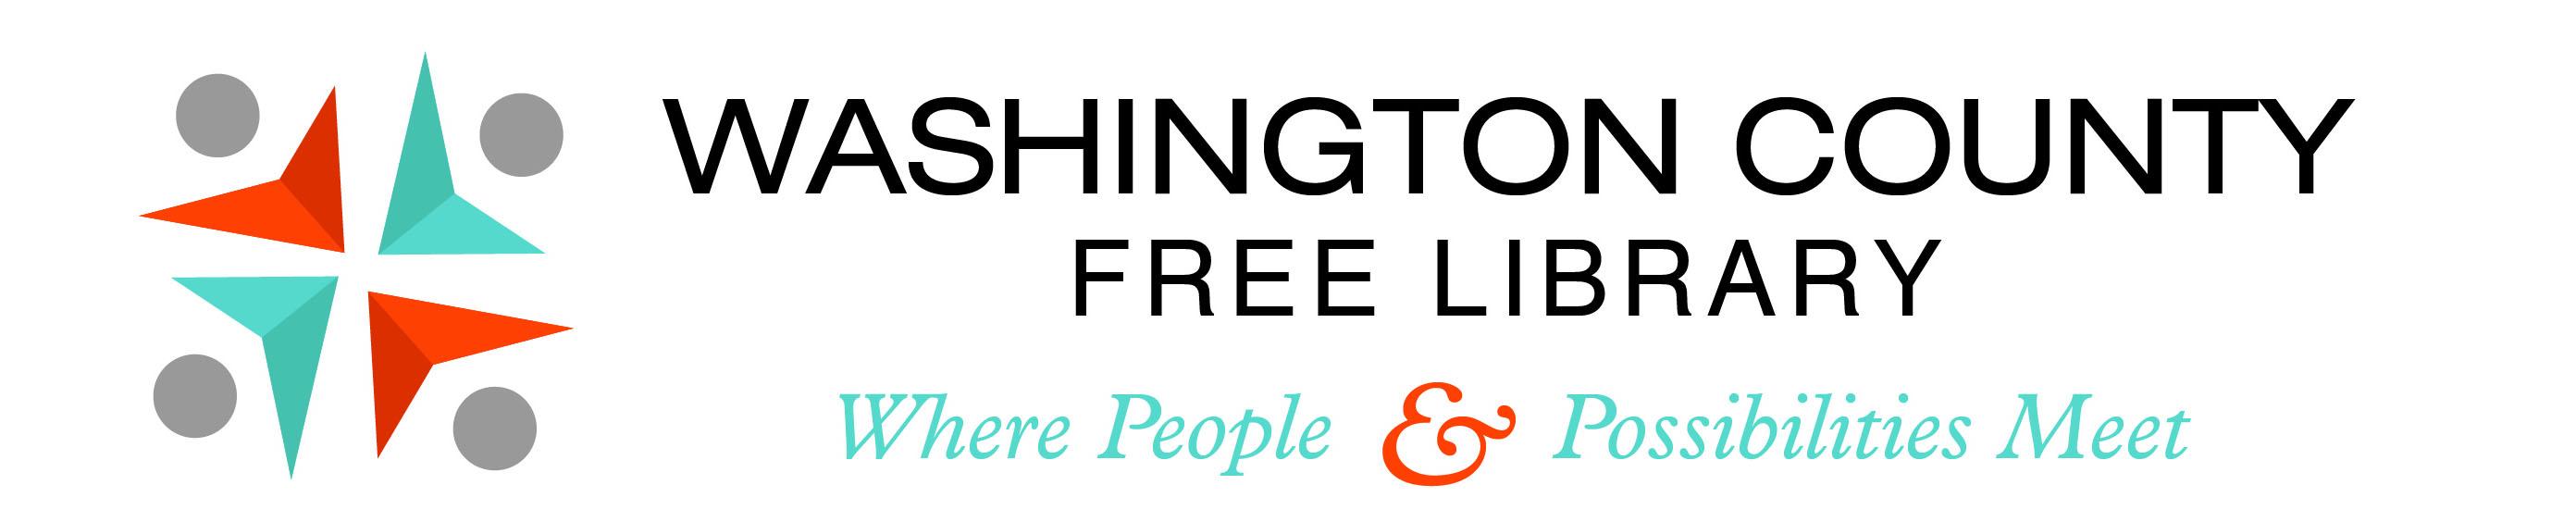 Washington County Free Library logo - 4 points reading book